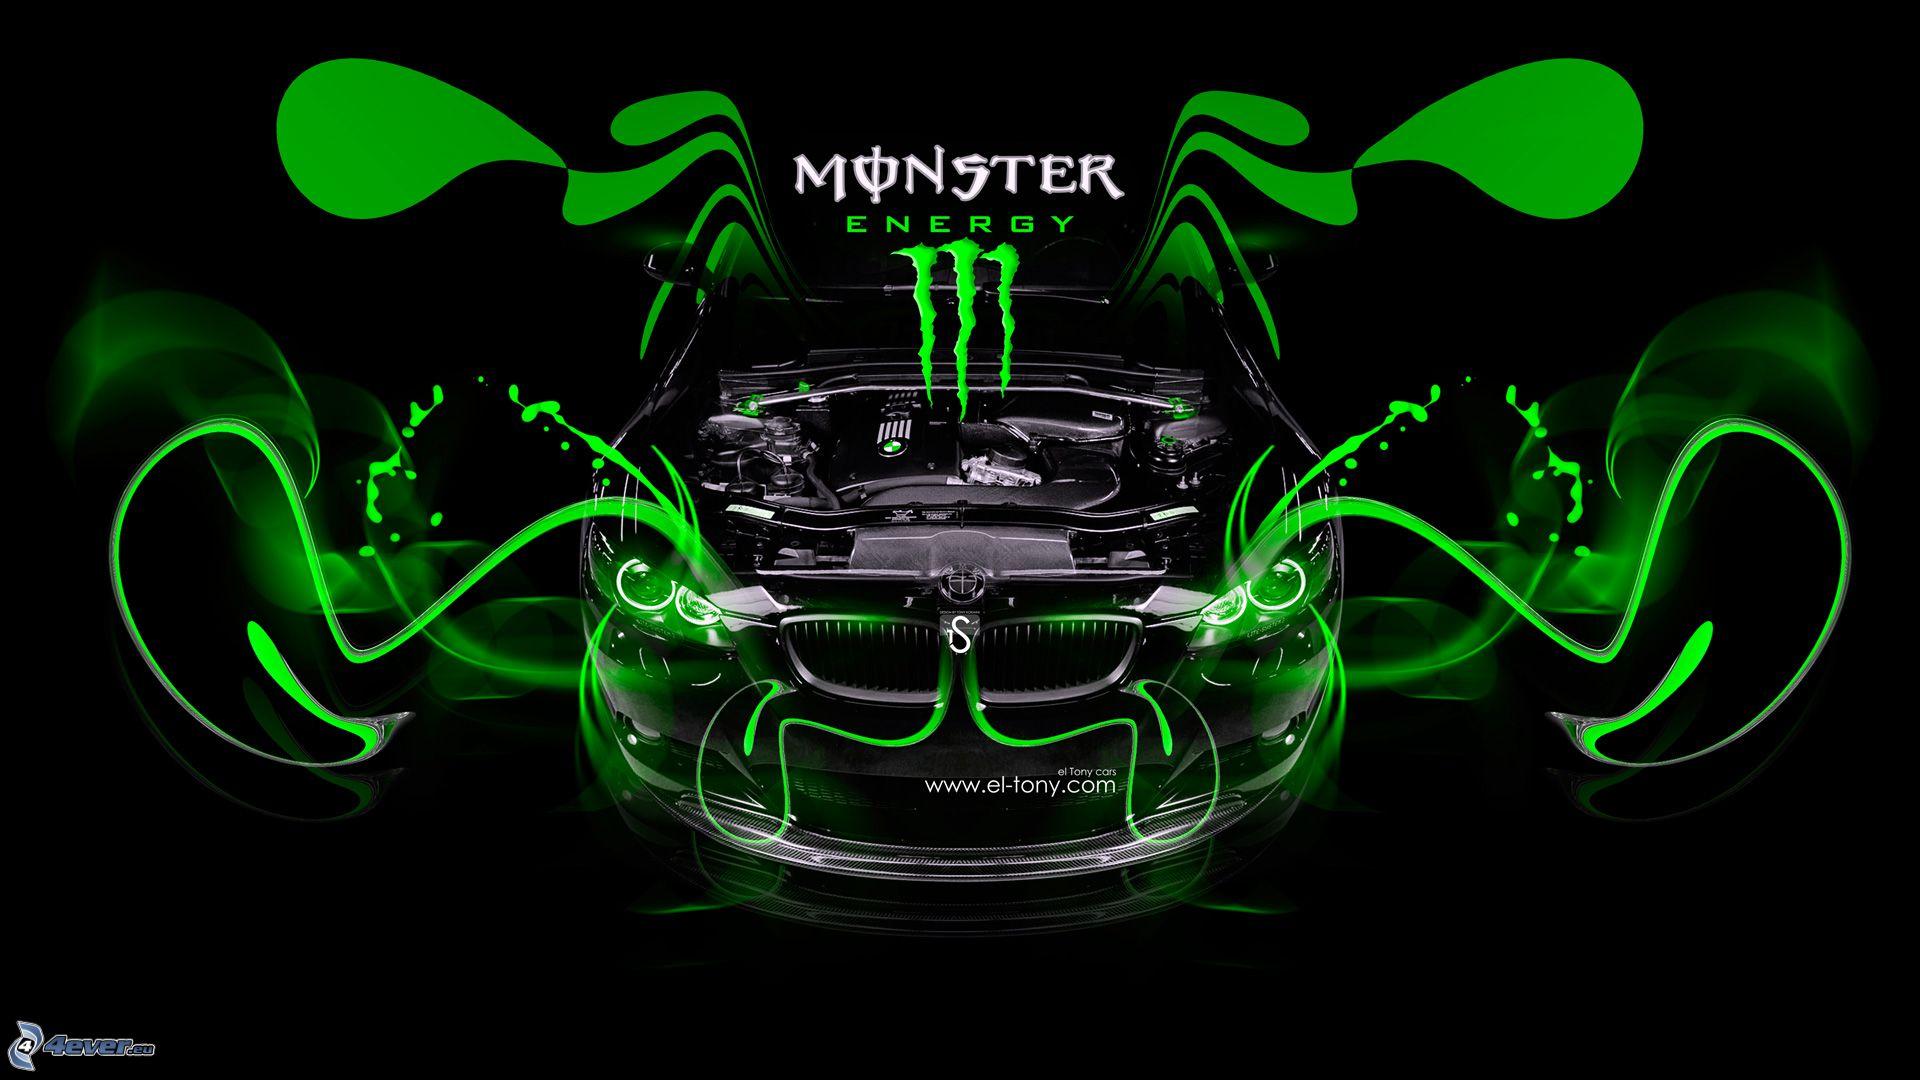 Monster energy voltagebd Choice Image